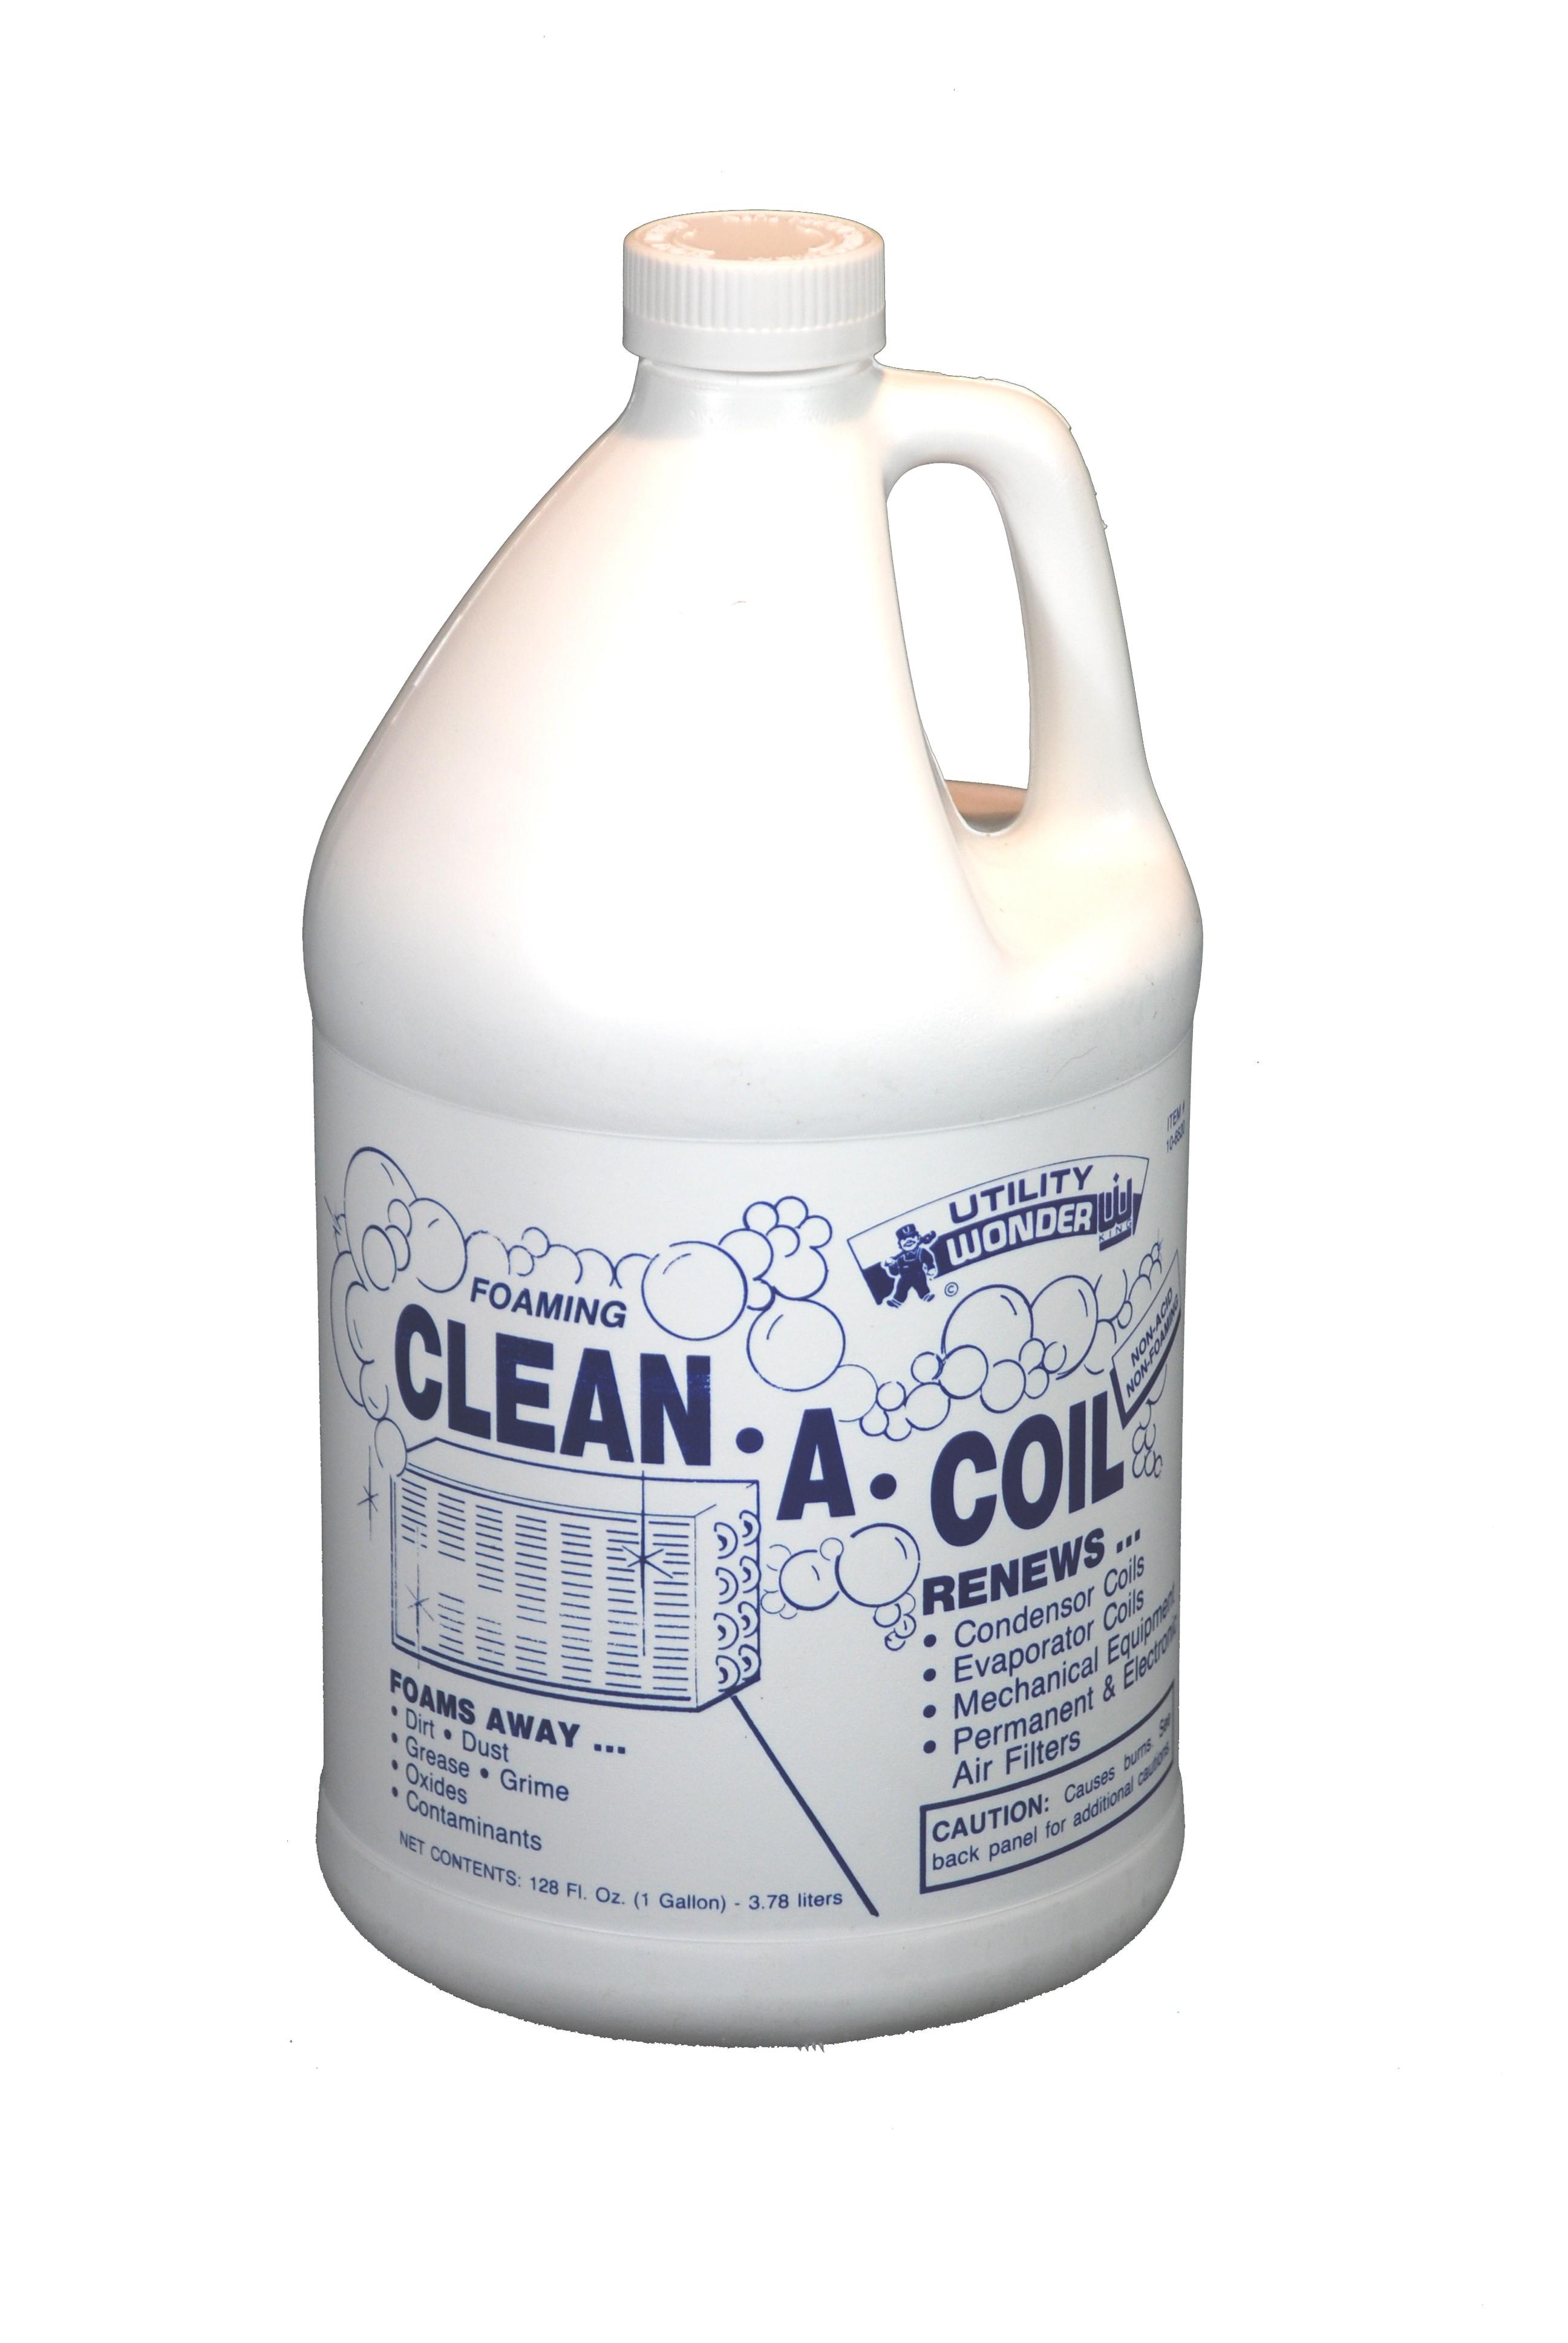 FOAMING CLEAN-A-COIL COIL CLEANER & BRIGHTENER